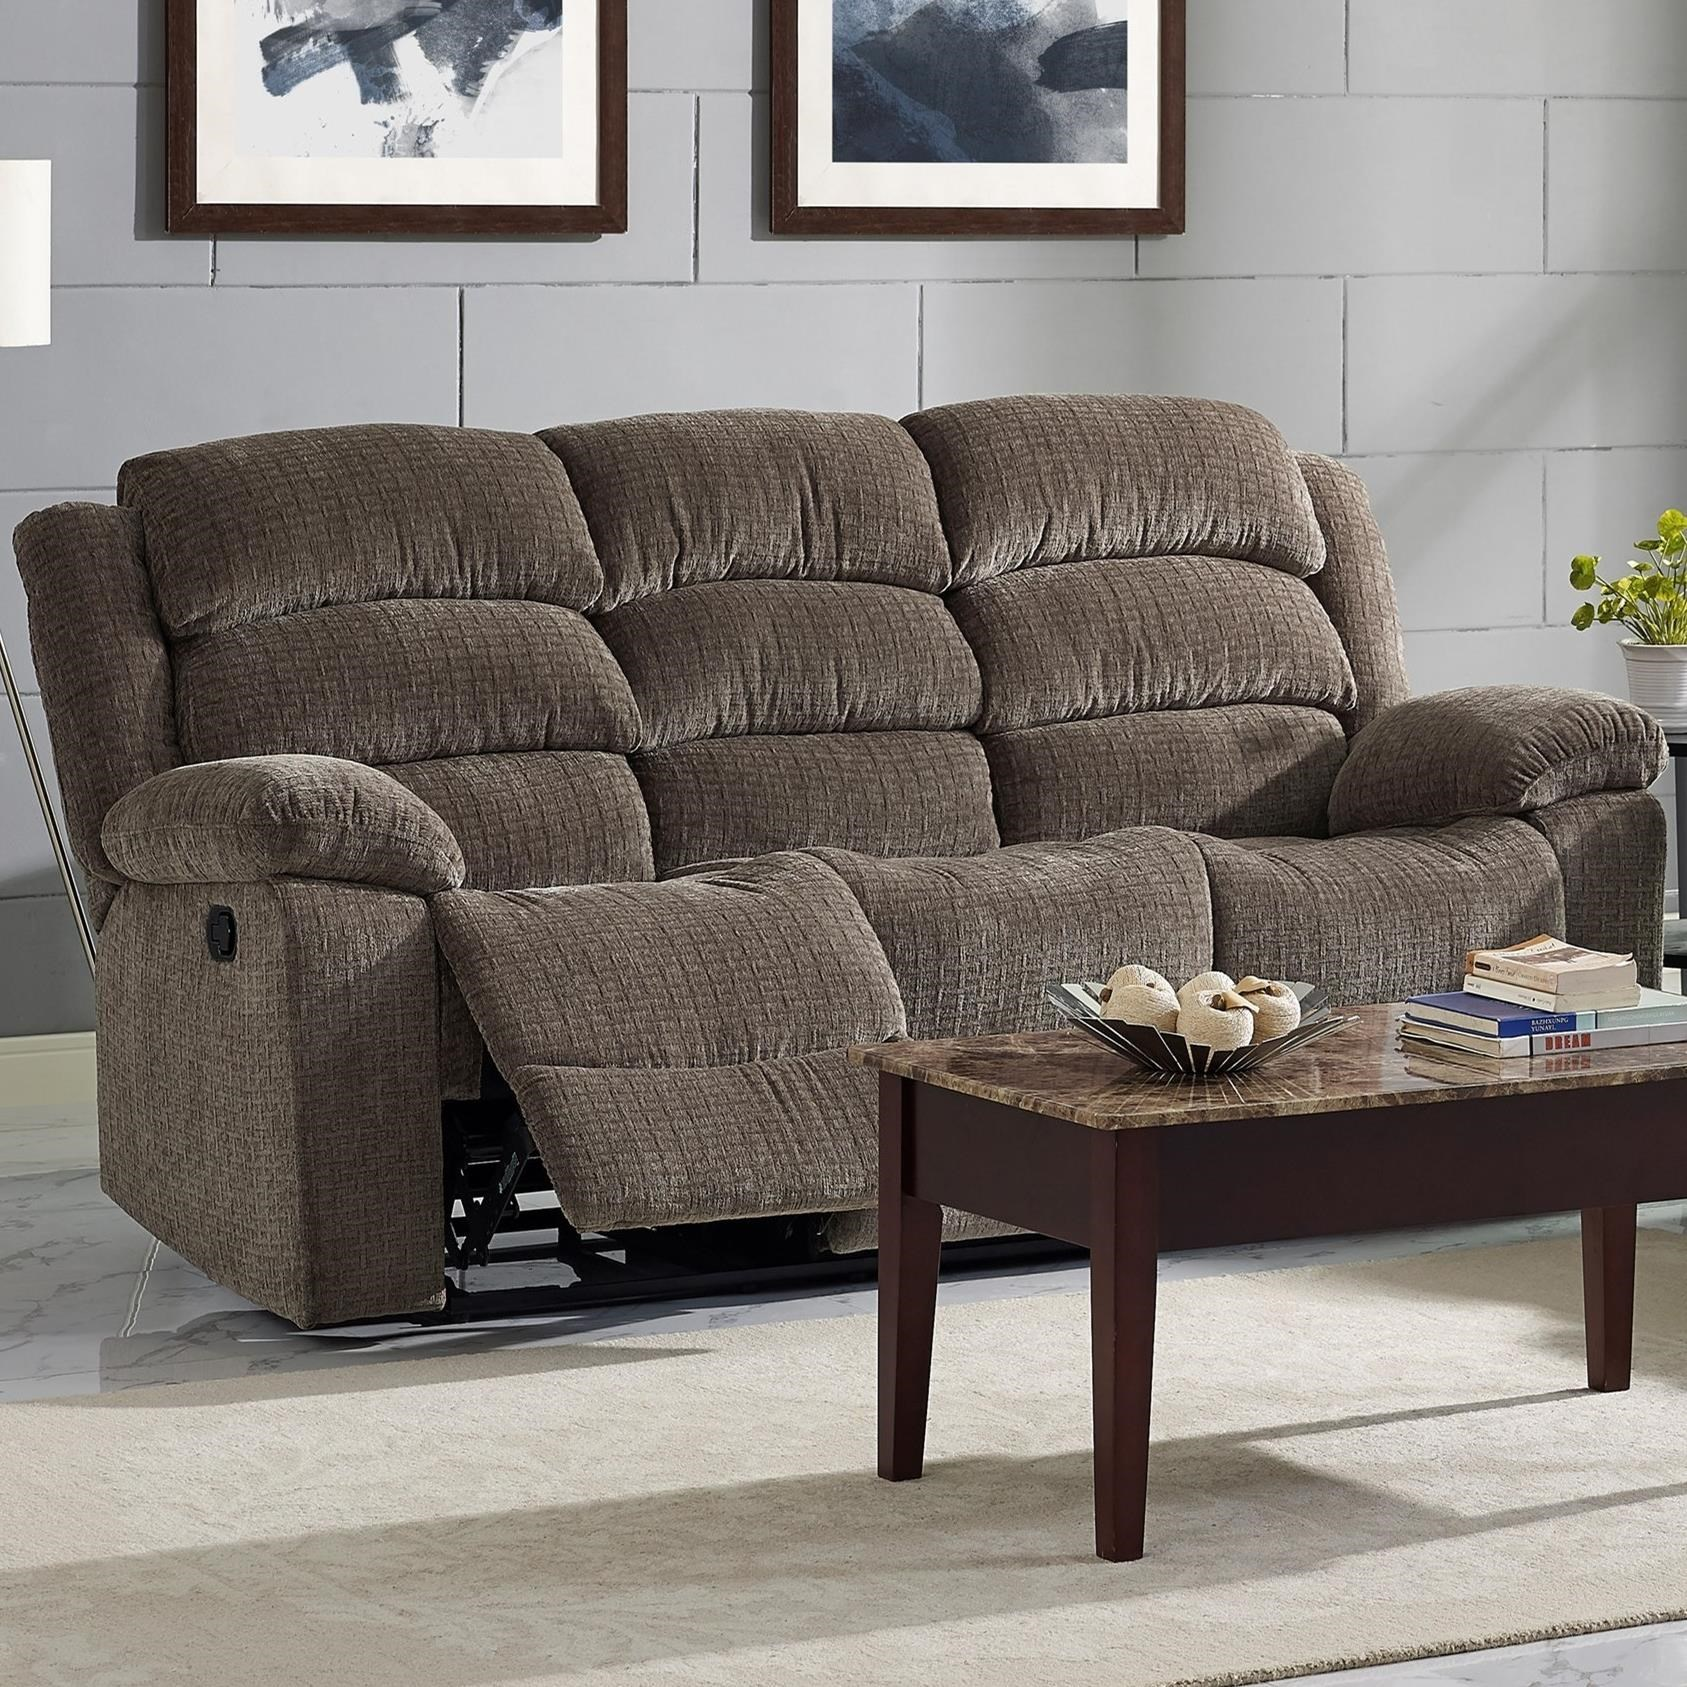 Beau New Classic AustinPower Reclining Sofa